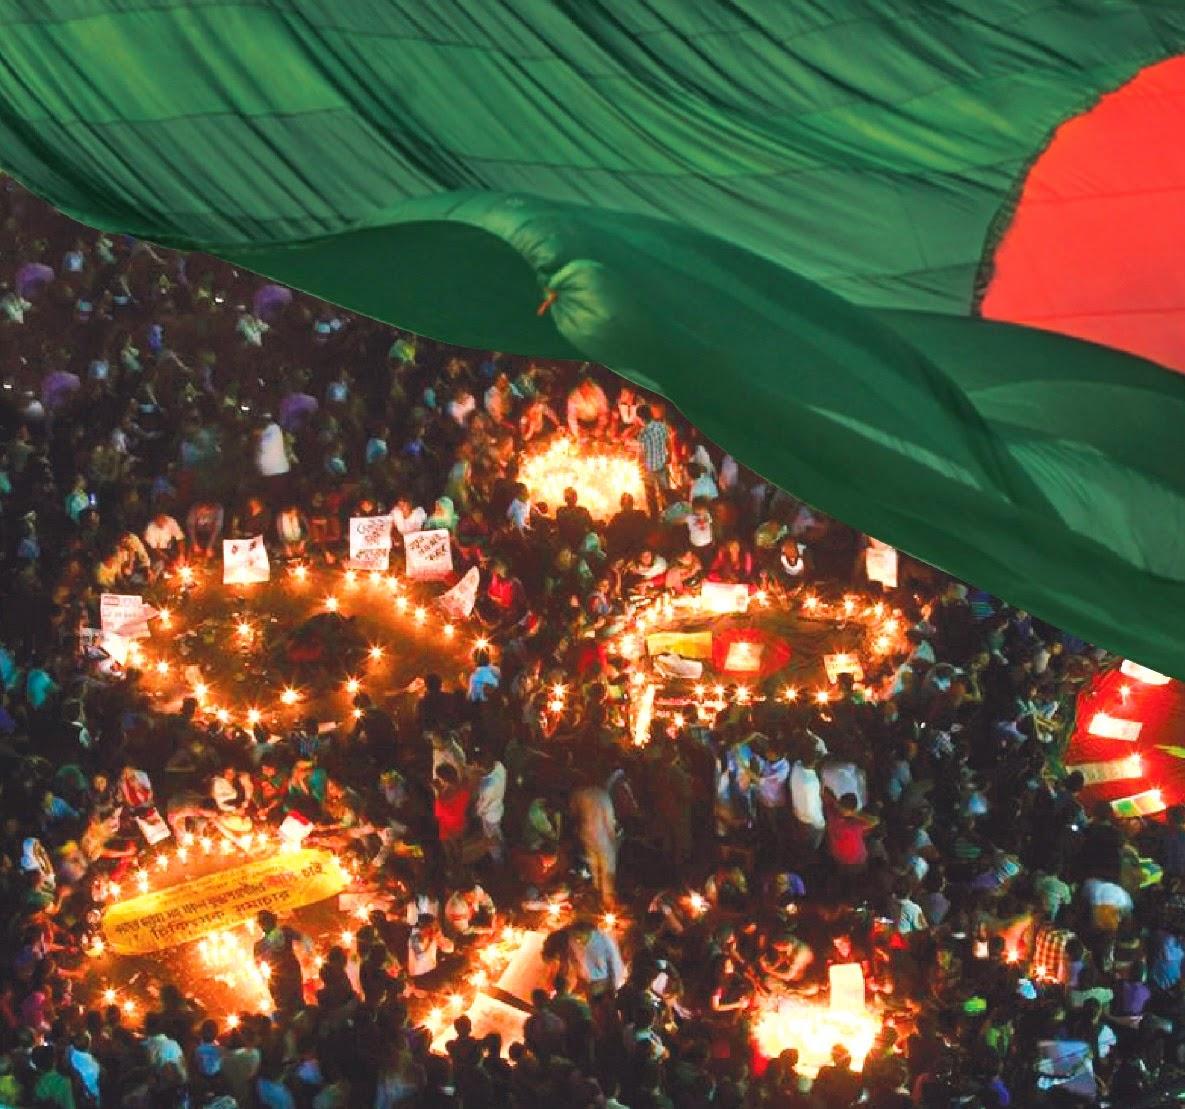 bangladesh wallpaper 2014 - photo #4